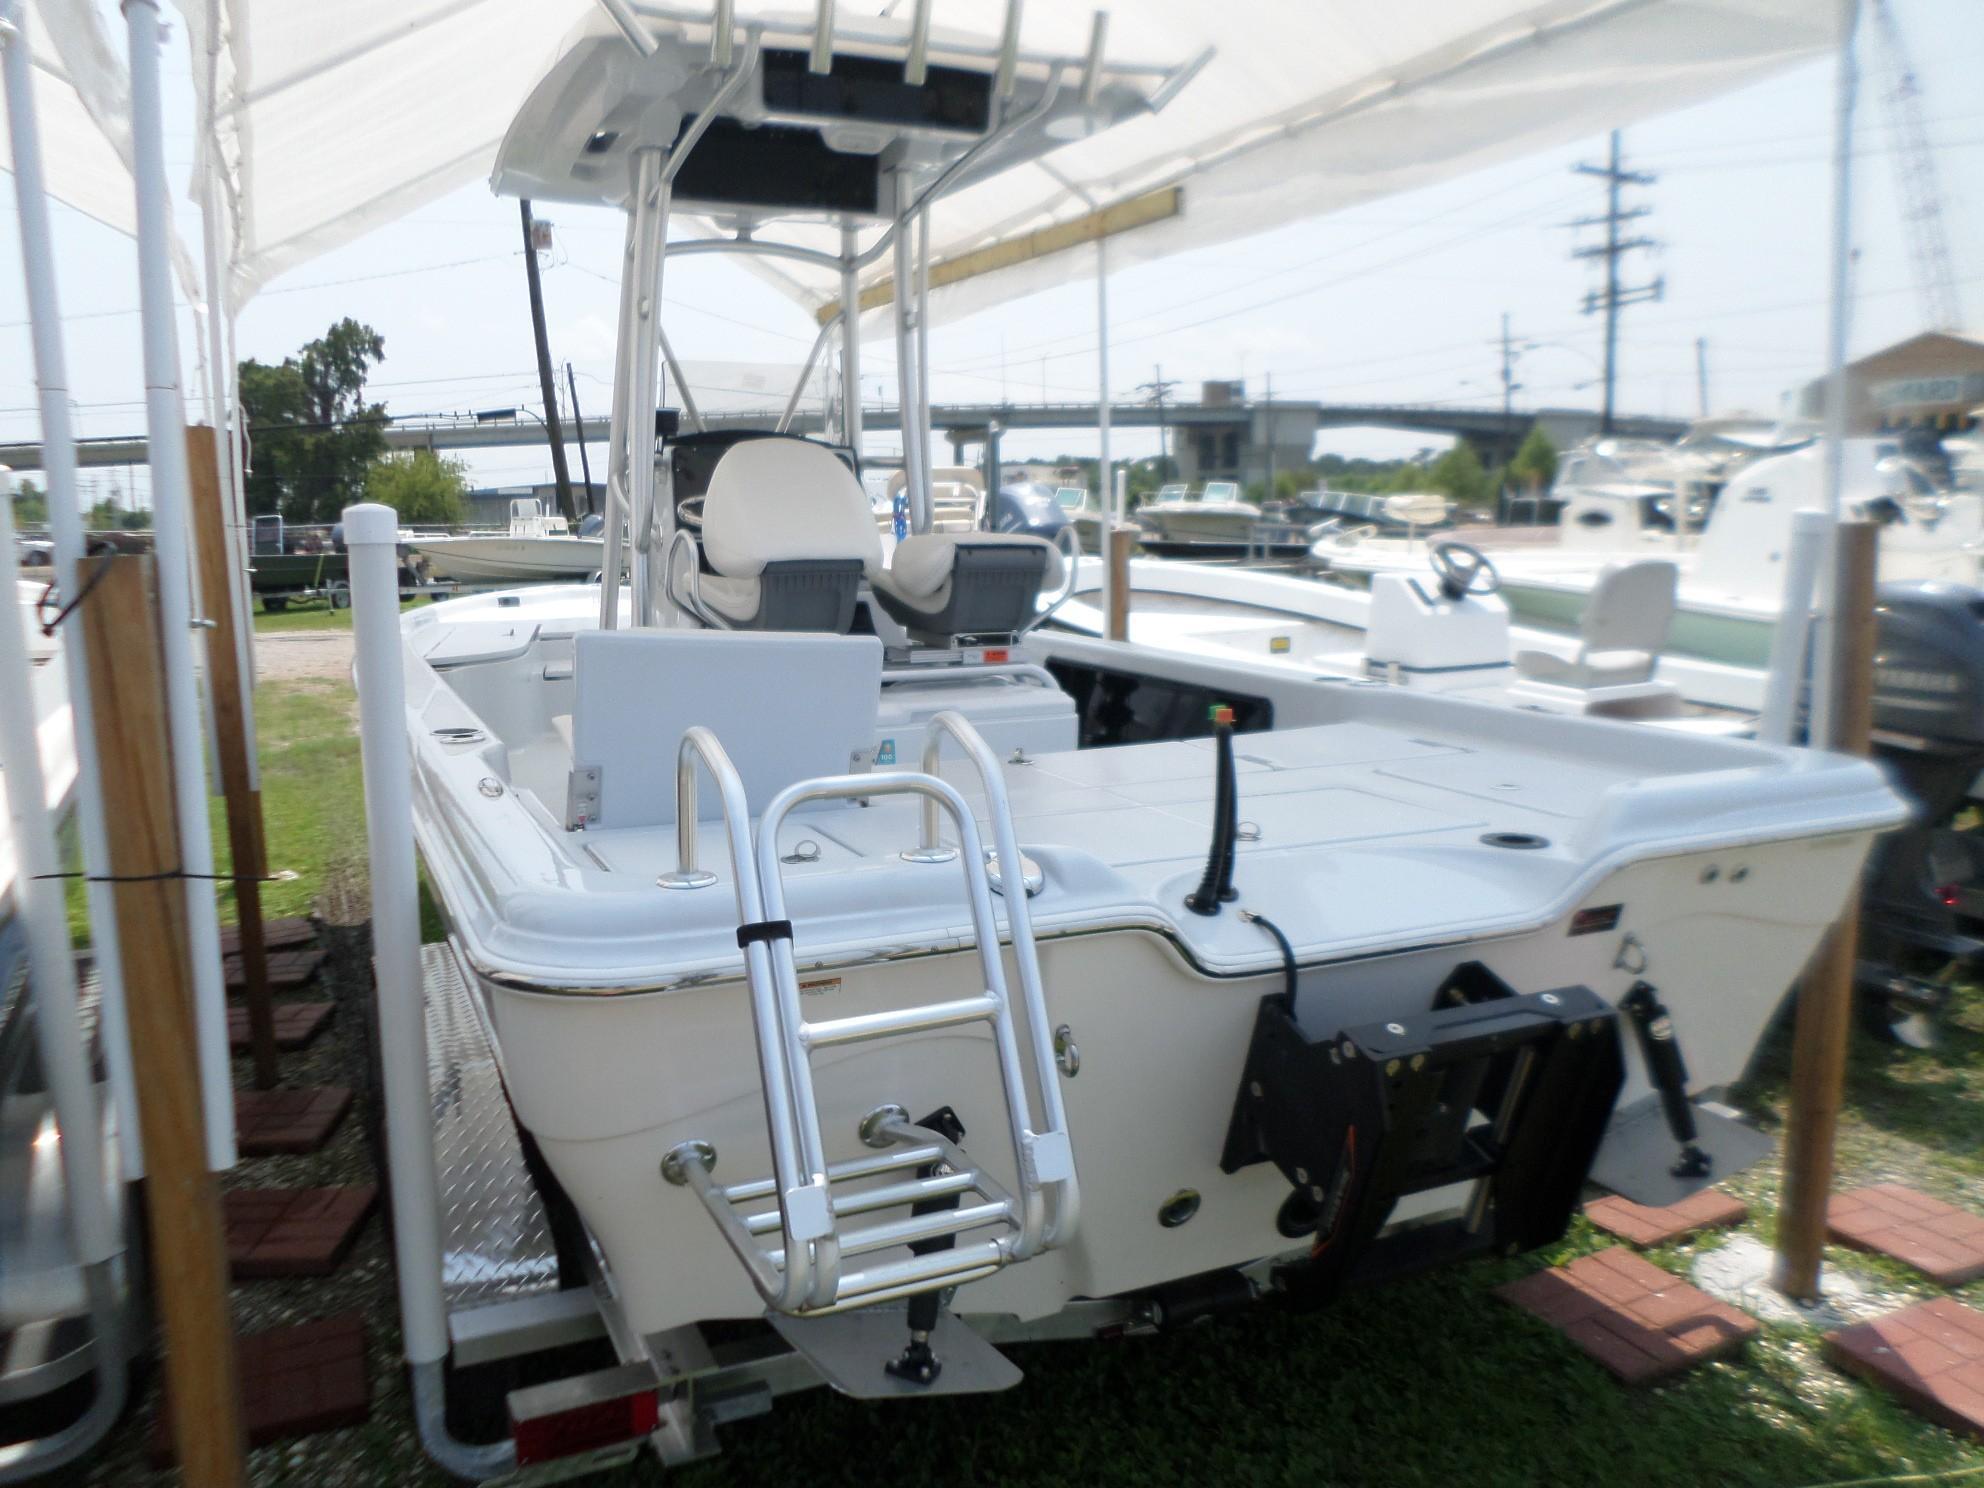 New  2019 24' Blue Wave 2400 PureBay Bay Boat in Slidell, Louisiana